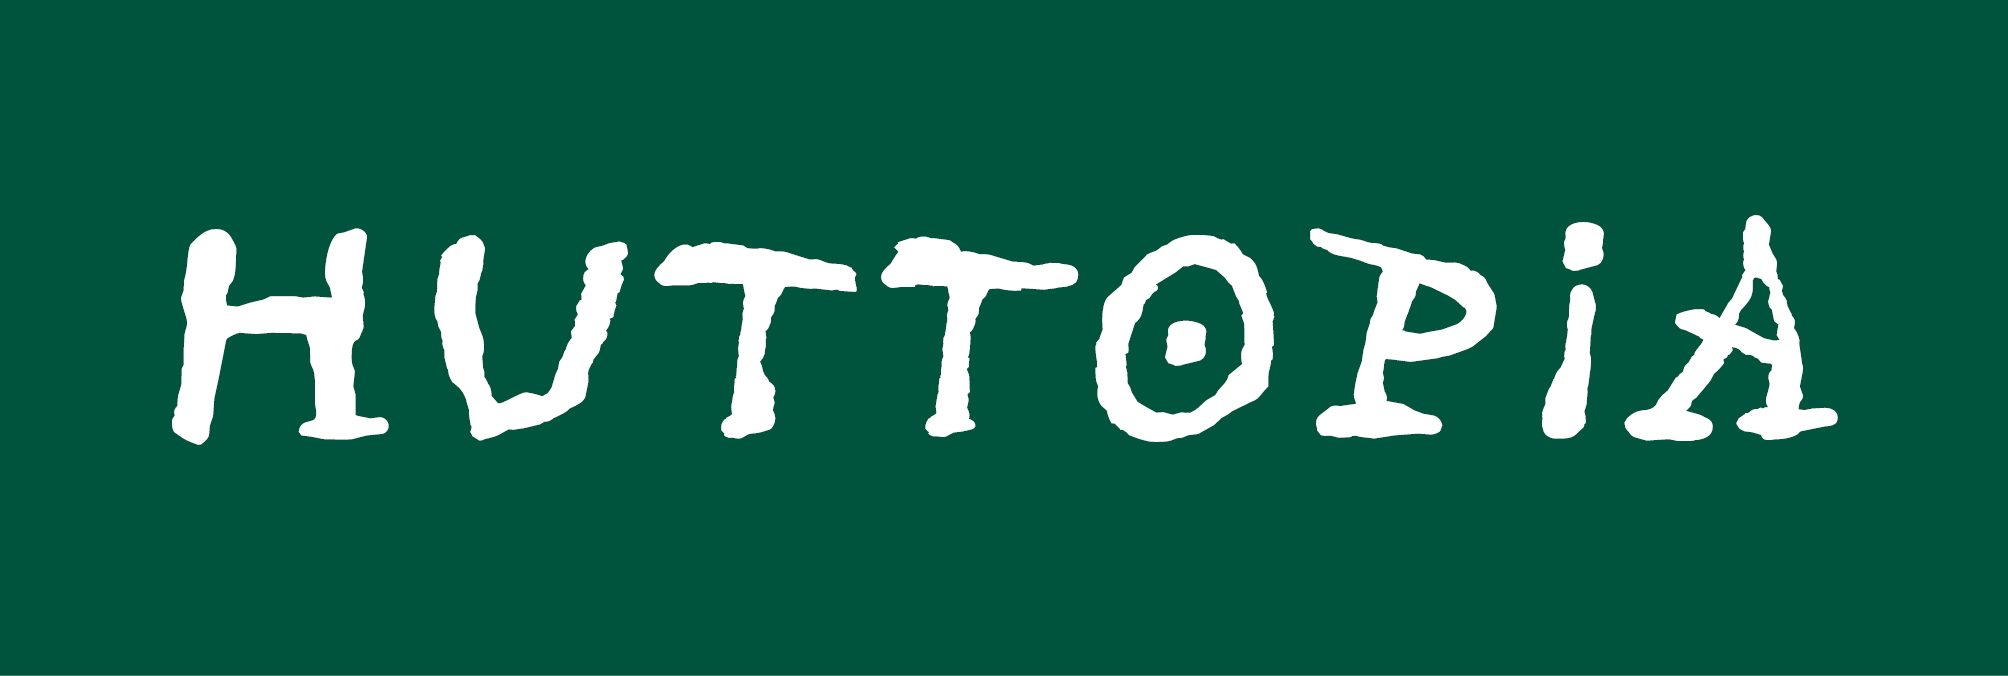 Huttopia Meursault